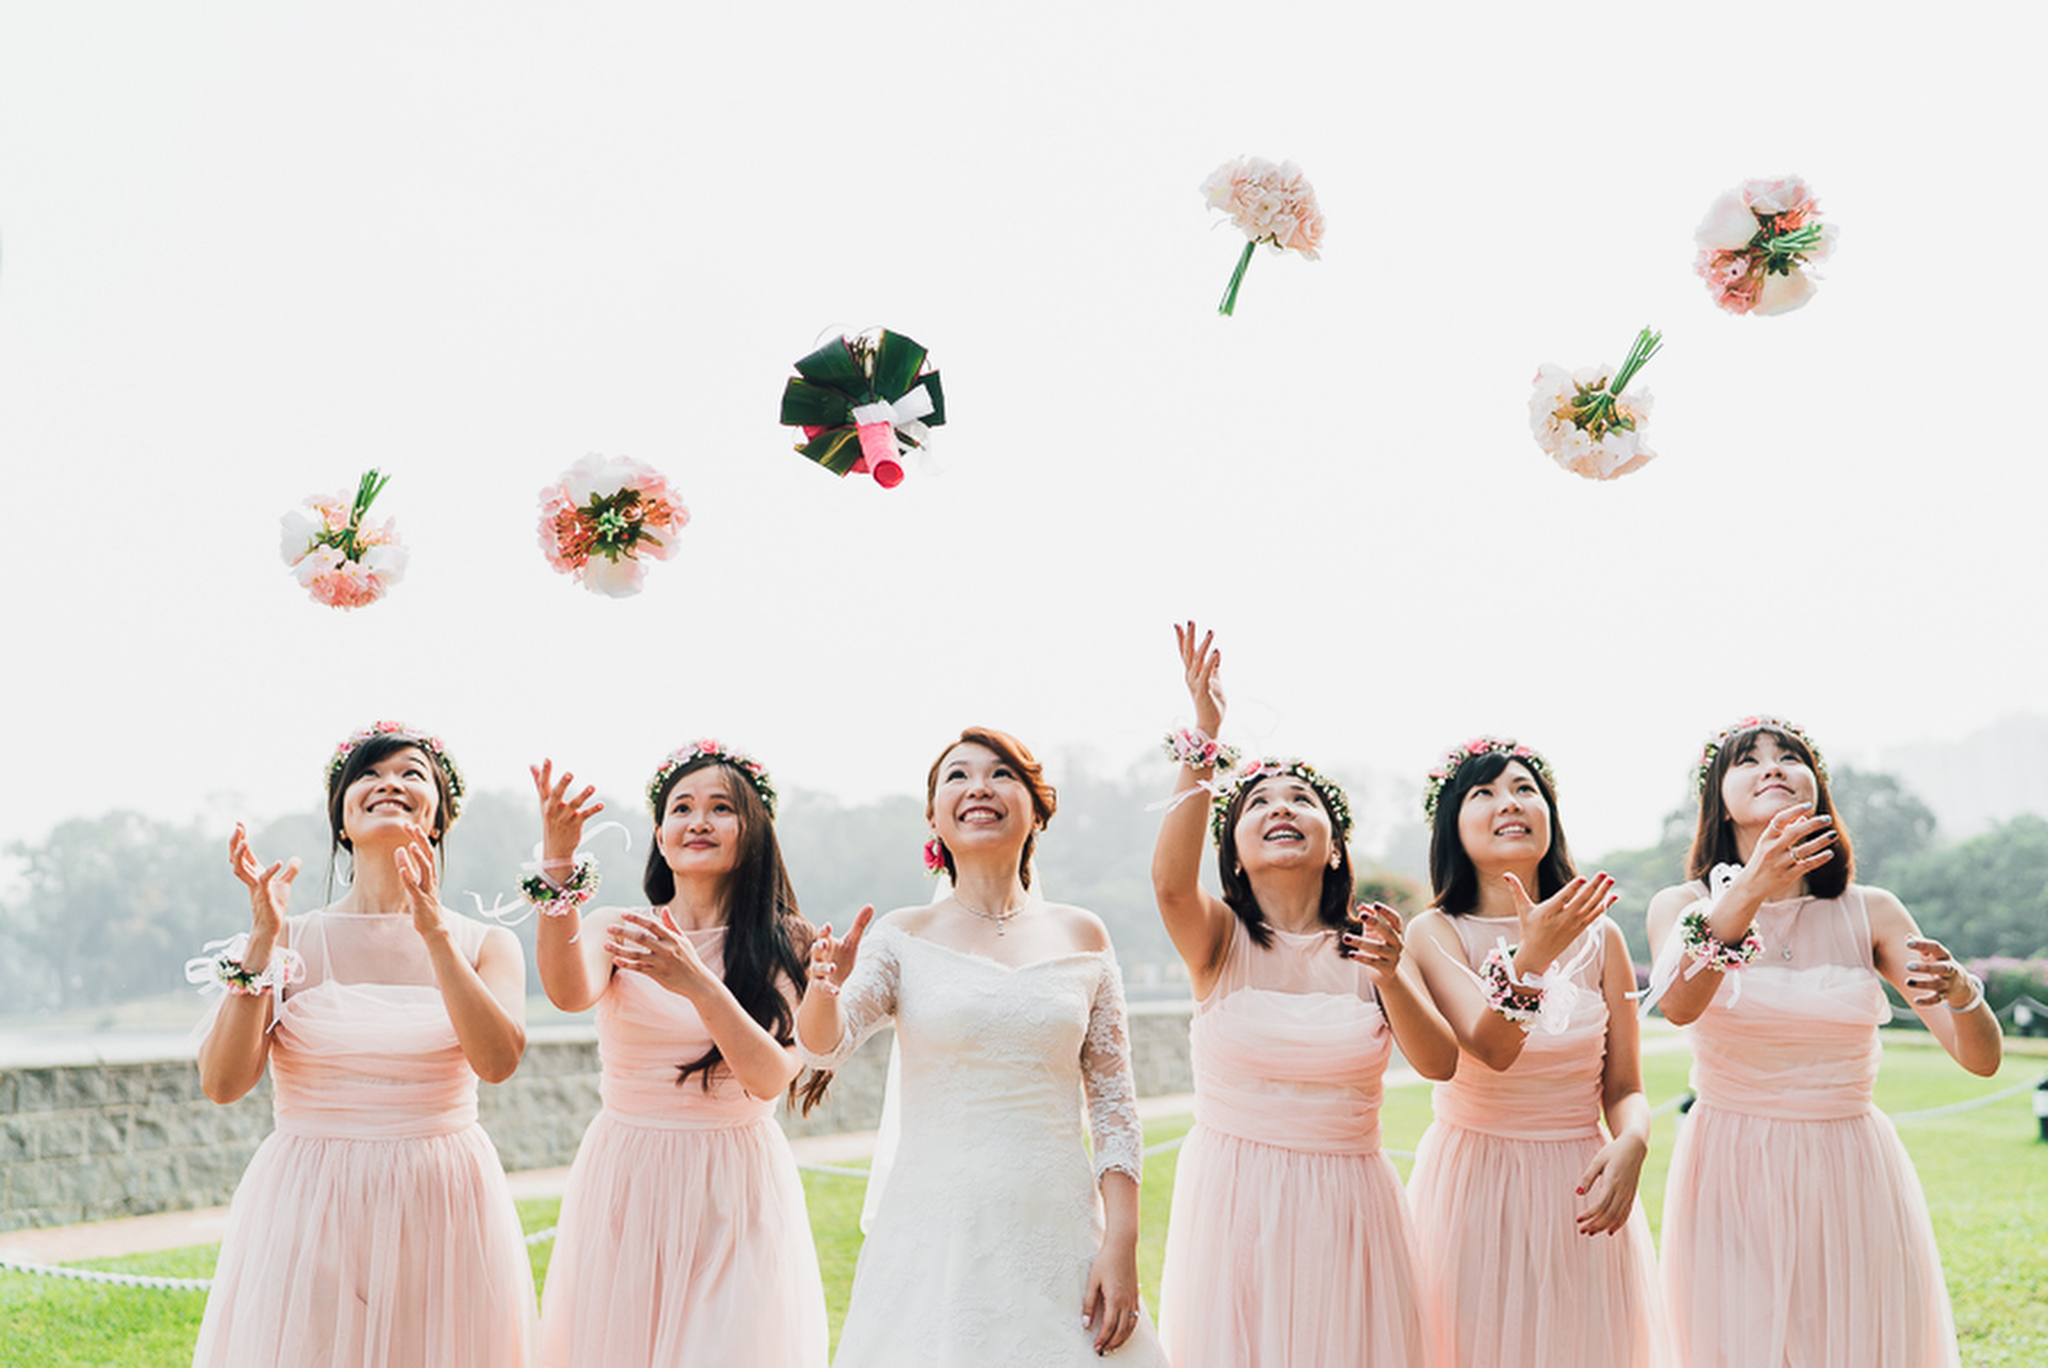 Singapore Wedding Photographer - Alvin & Mischelle Actual Day Wedding (38 of 86).JPG